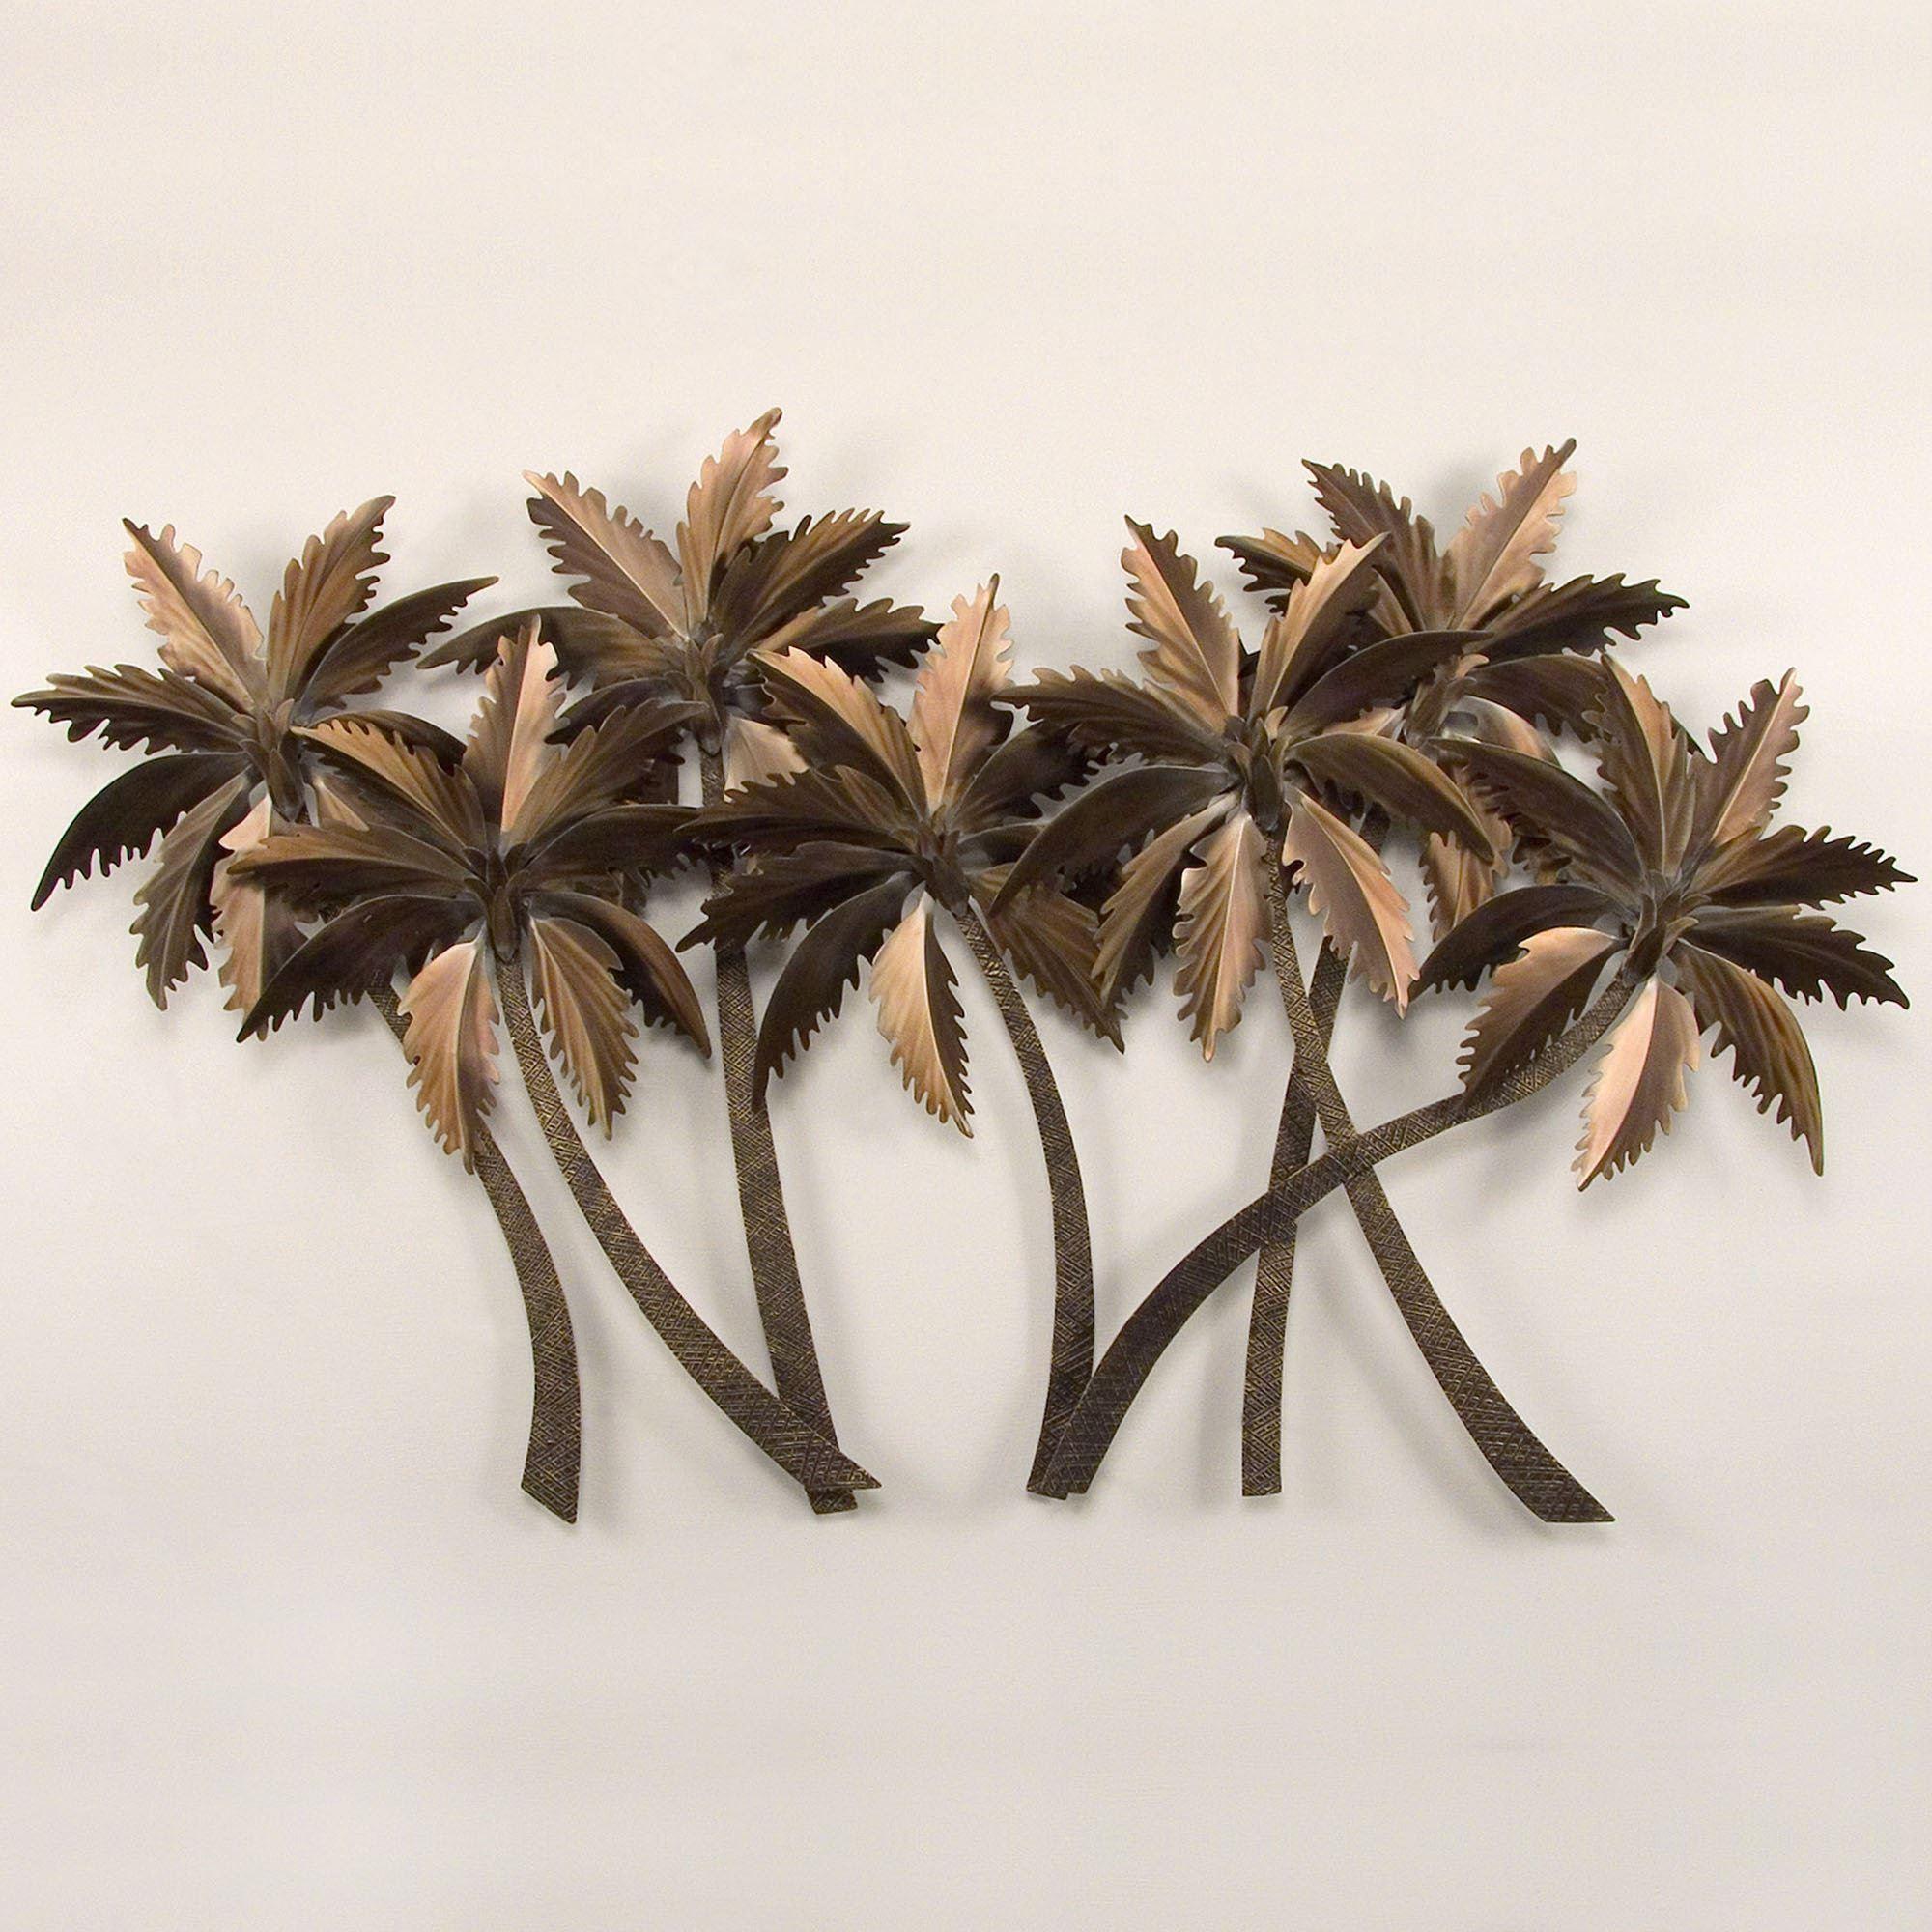 Tropical Palm Grove Metal Wall Sculpture Inside Palm Tree Metal Wall Art (View 2 of 20)